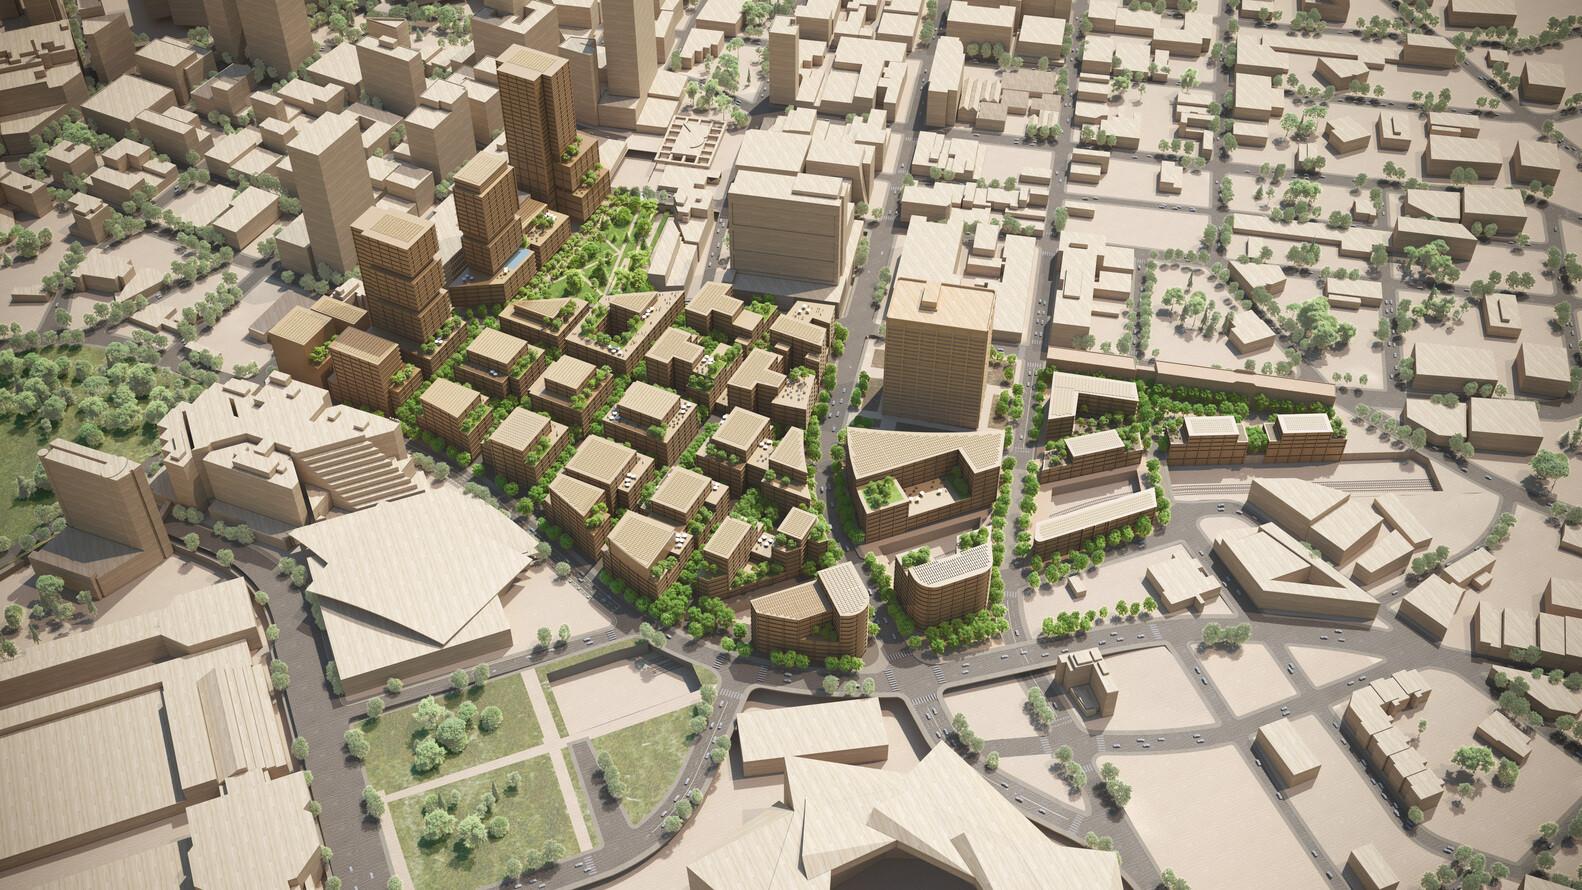 foster-partners-presento-su-propuesta-para-regenerar-centennial-yards-1-alt